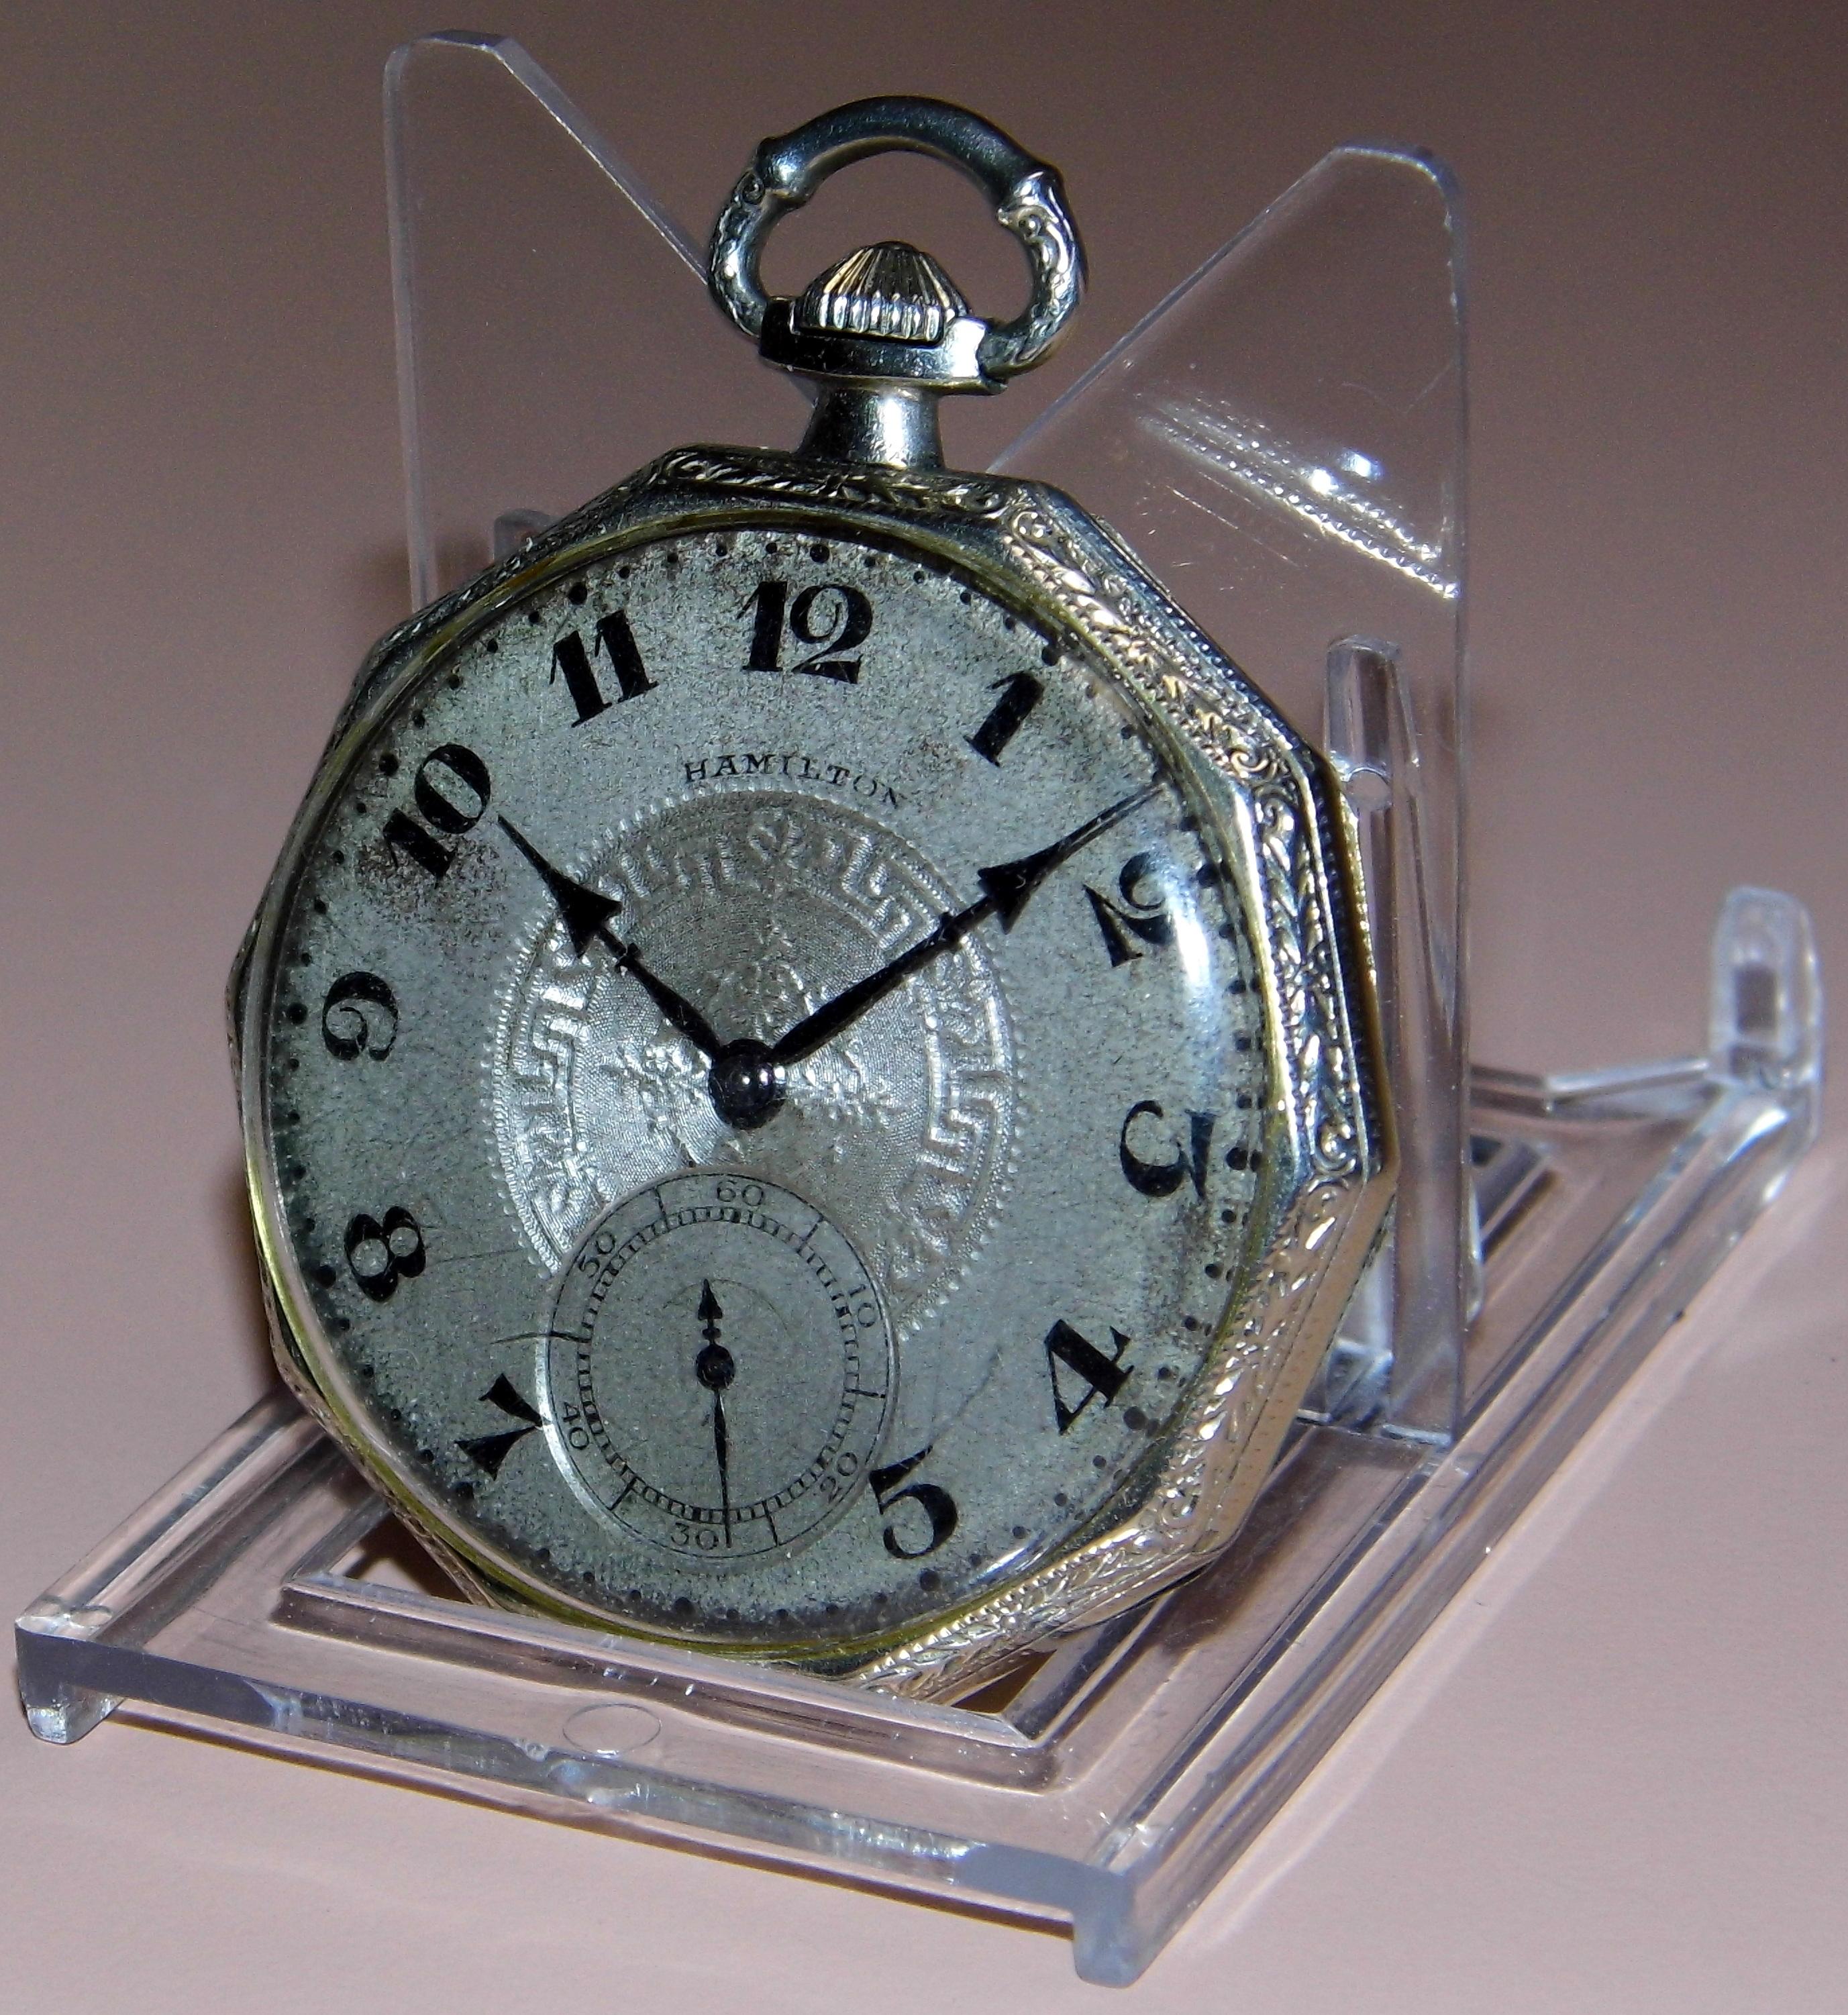 filevintage hamilton pocket watch size 12s 17 jewels